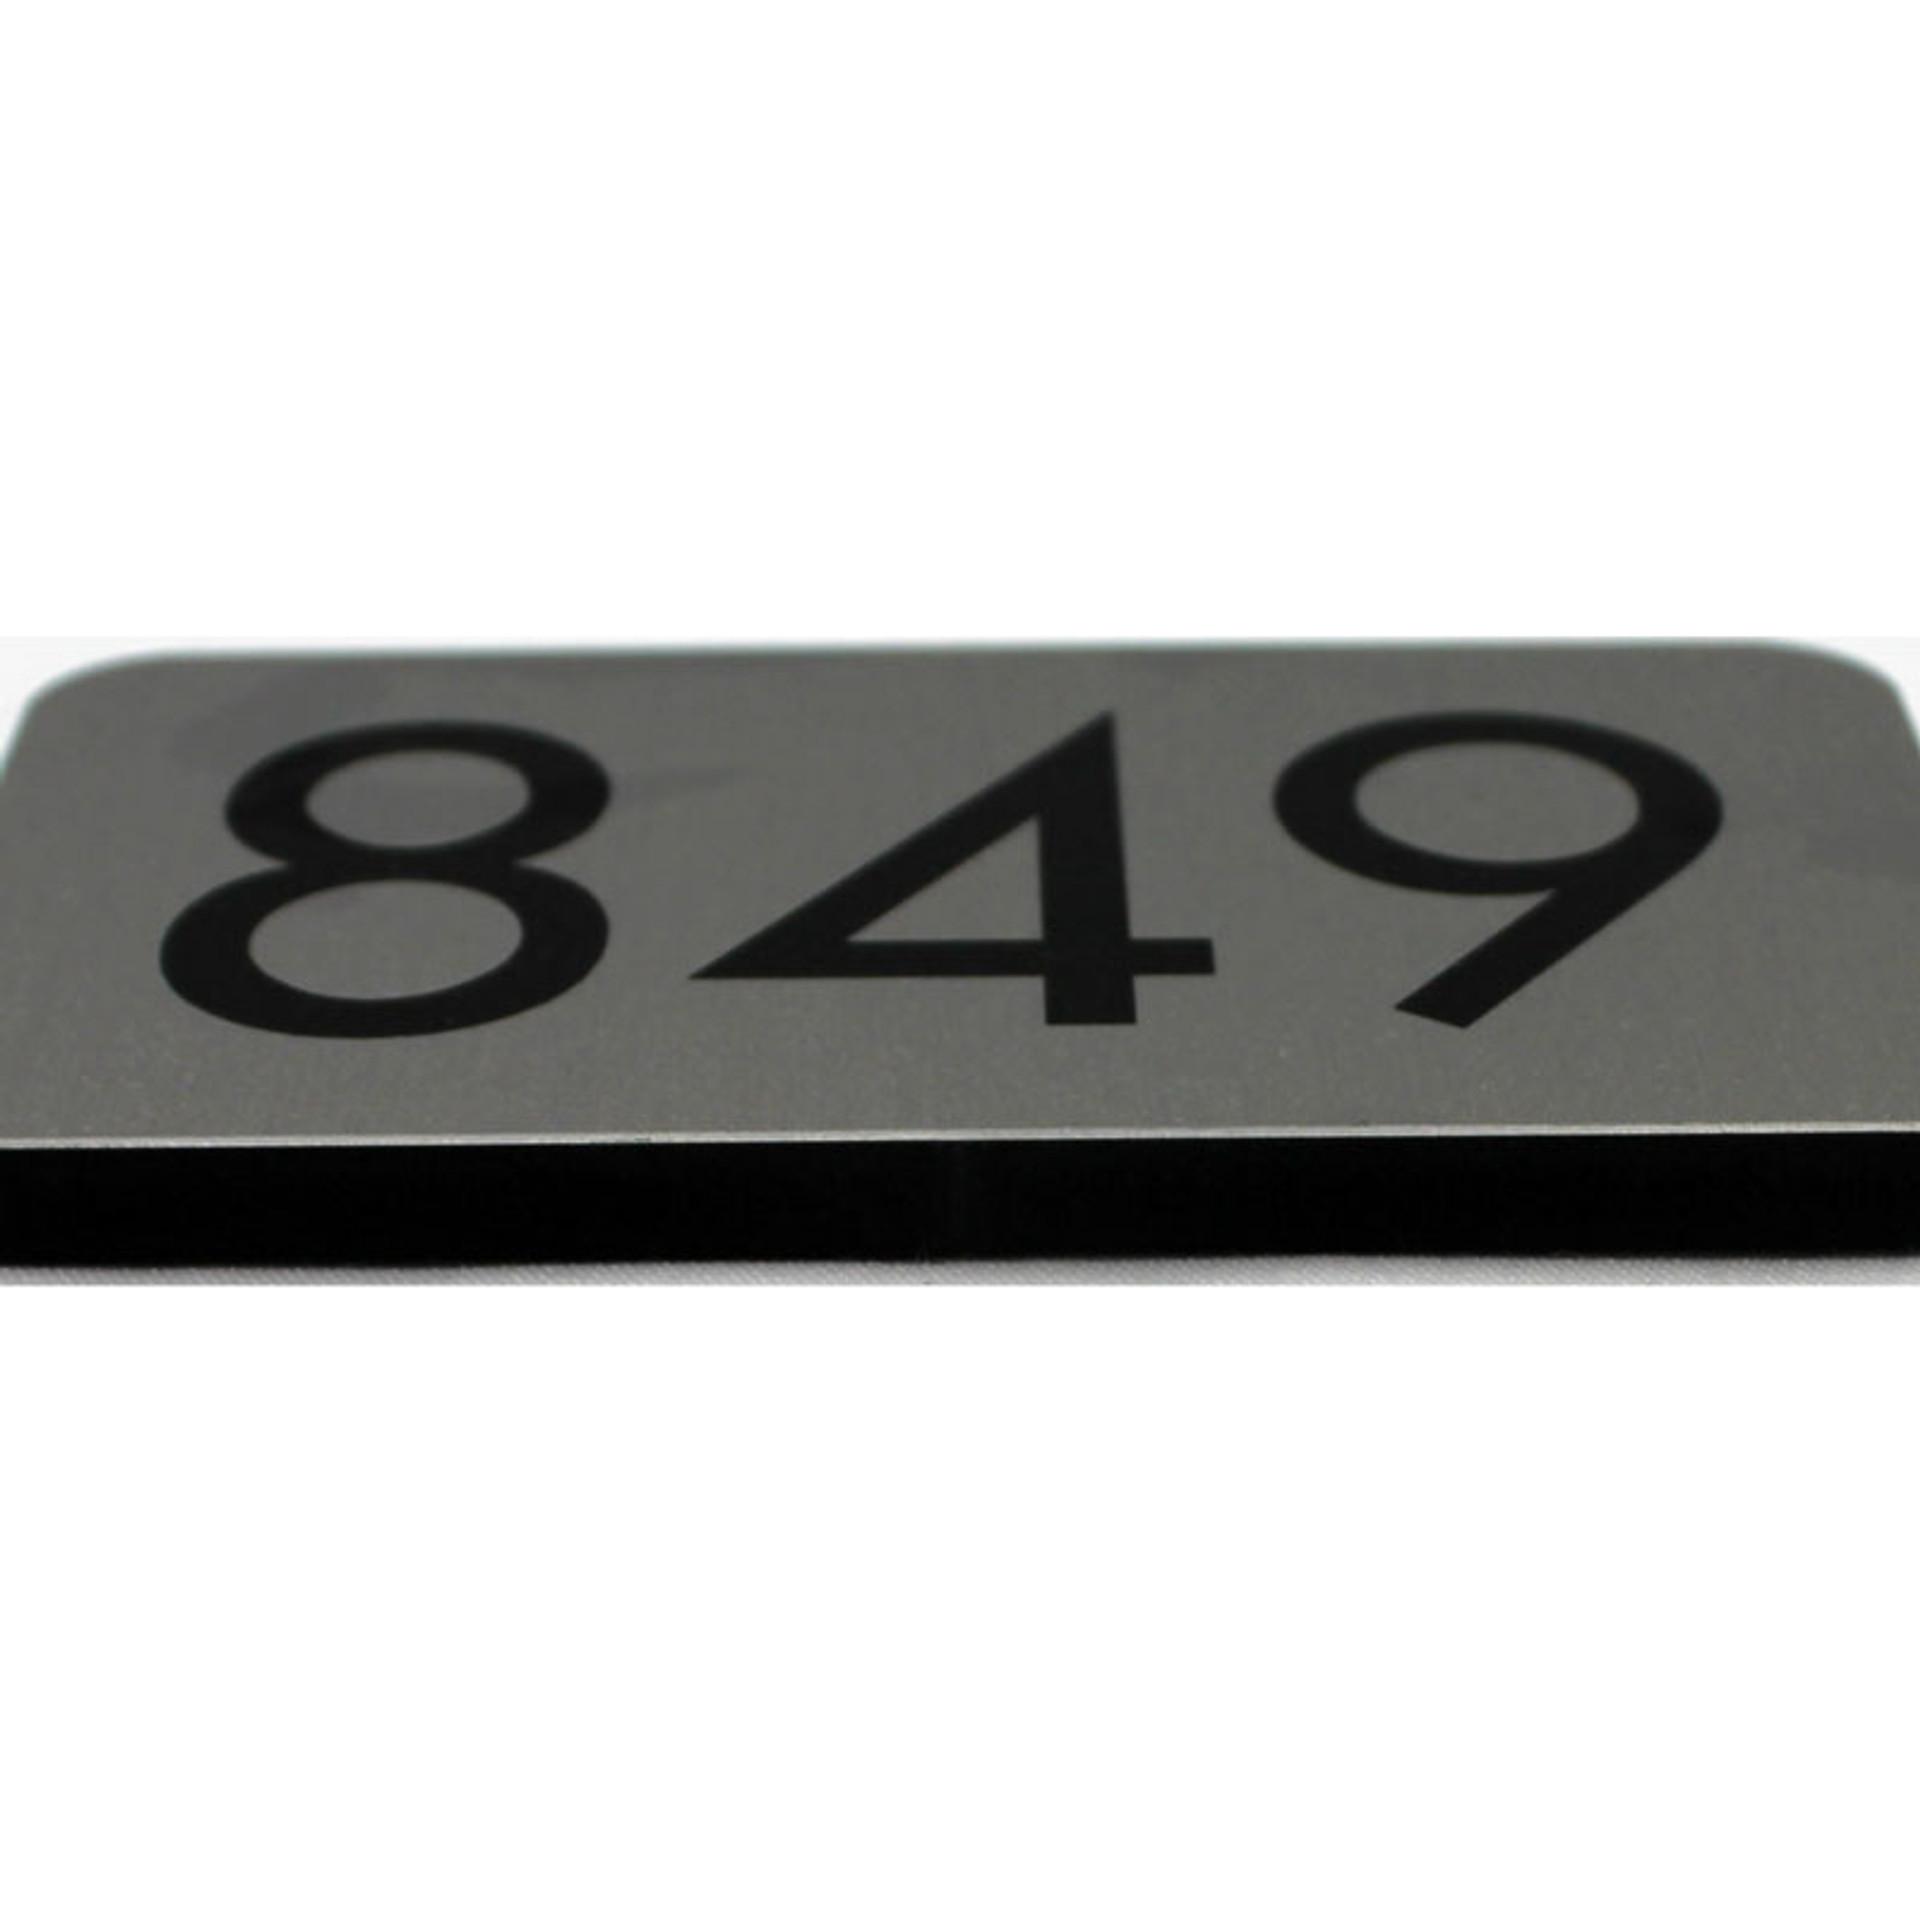 "Raised Profile Door Sign - 2"" x 4"""